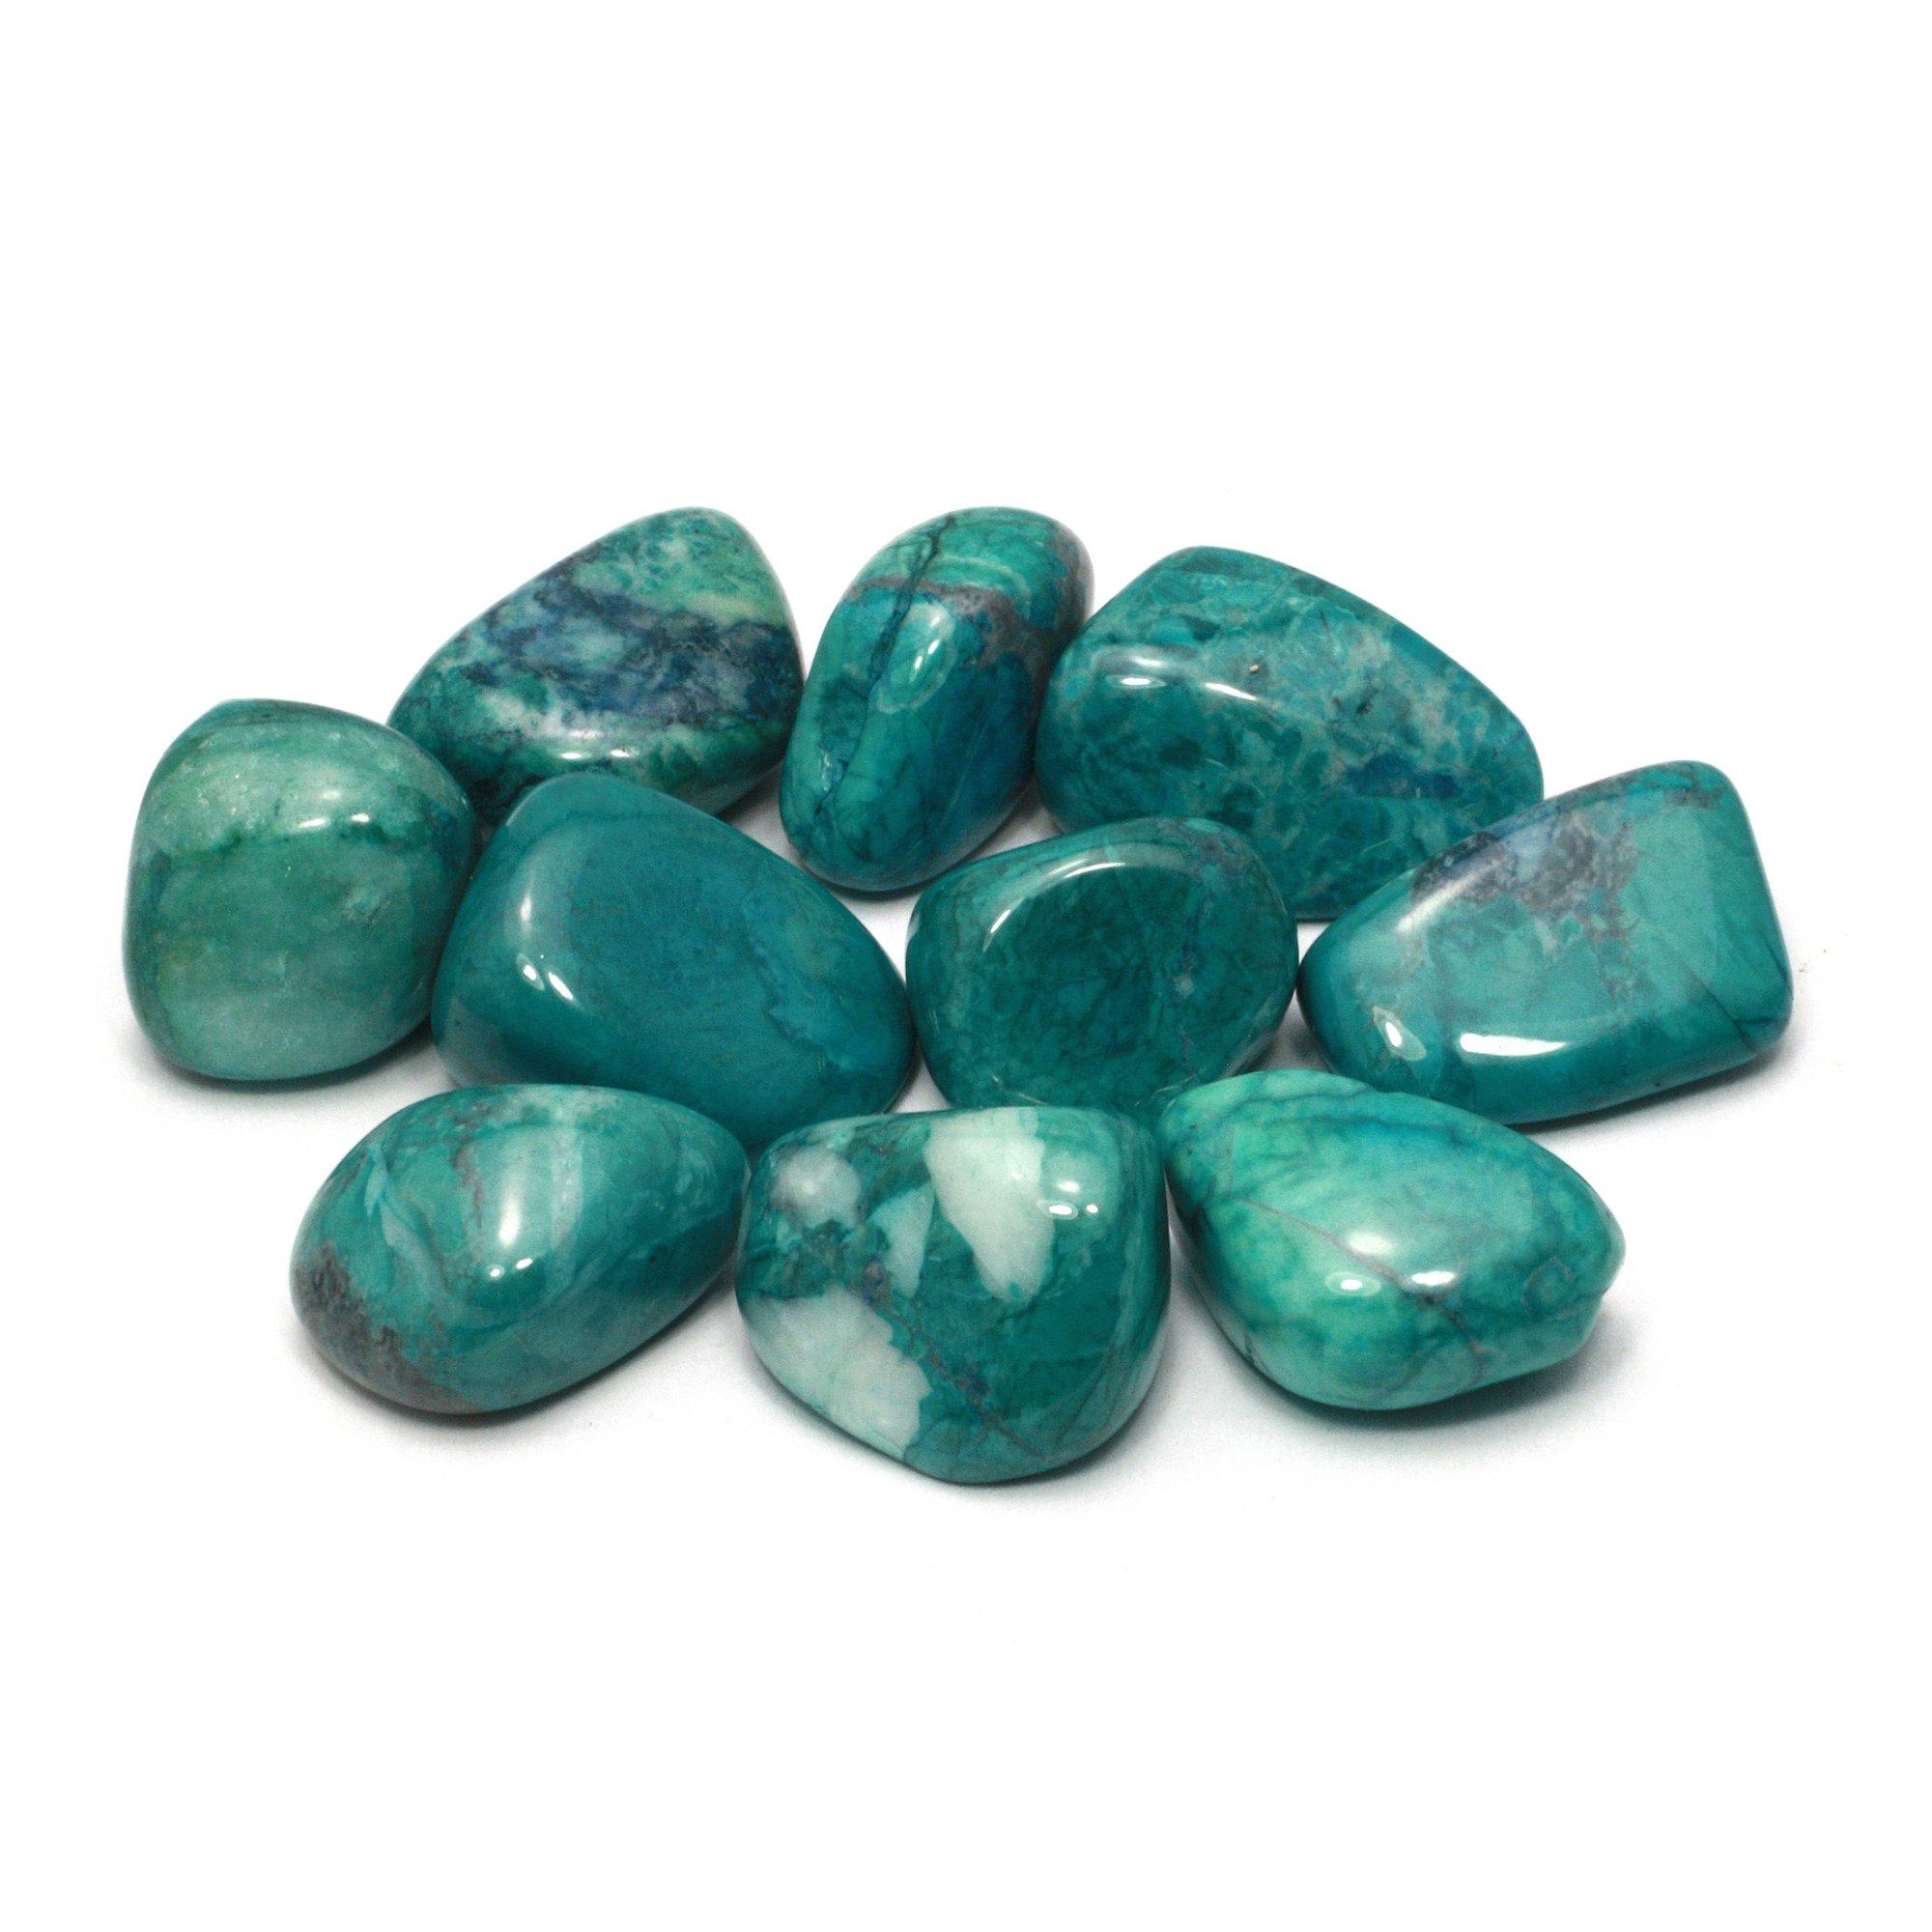 Chrysocolla Howlite Tumble Stone 20 25mm